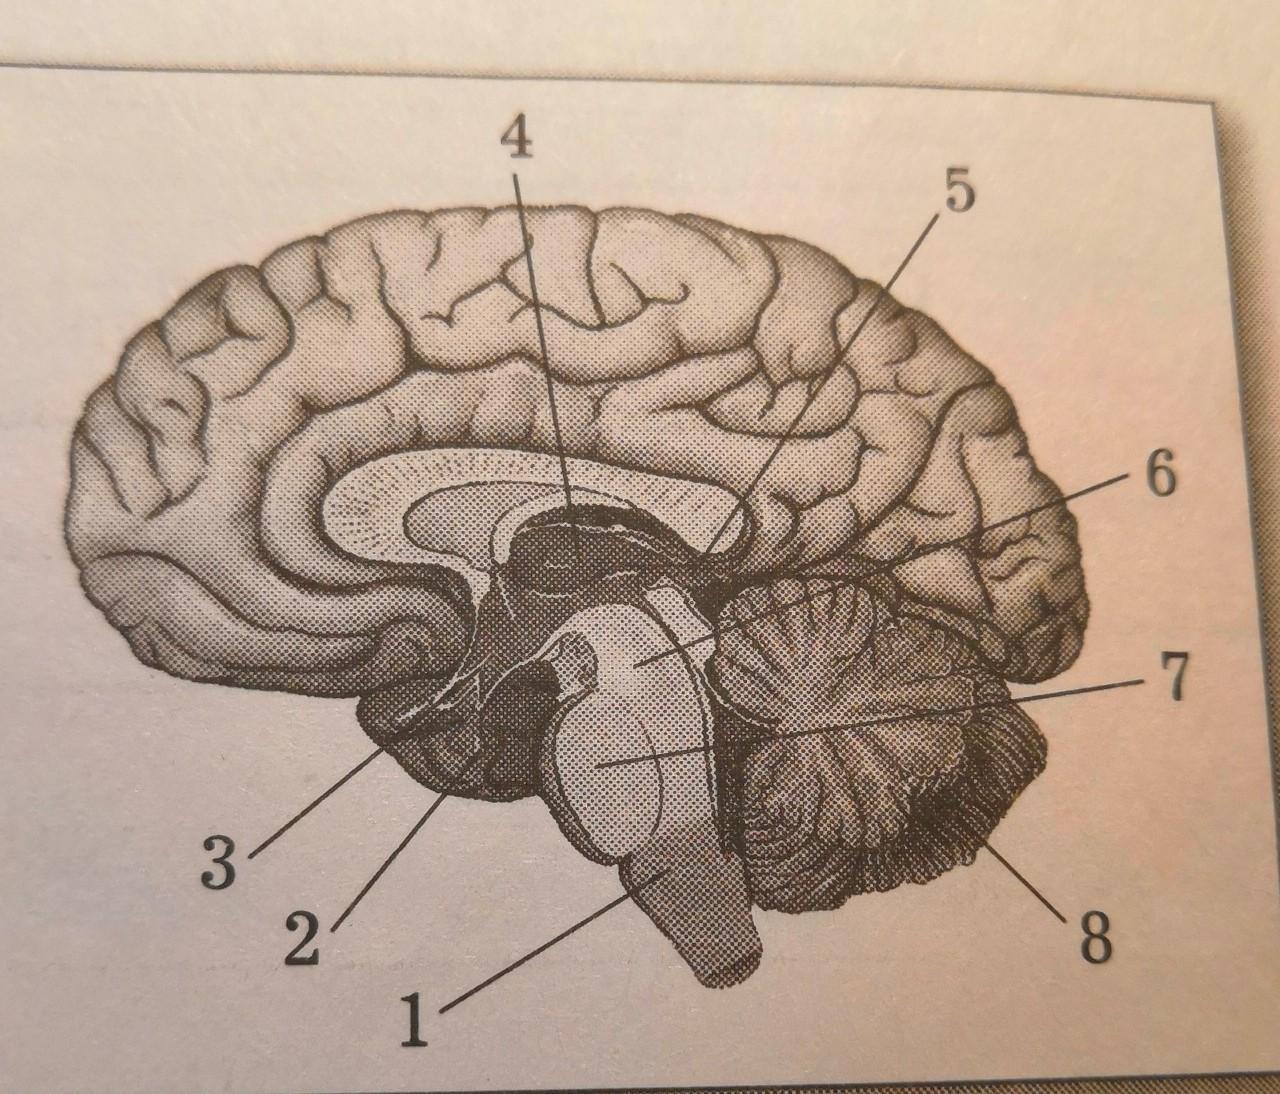 обучили картинки головного мозга с отделами бизнесе тимати